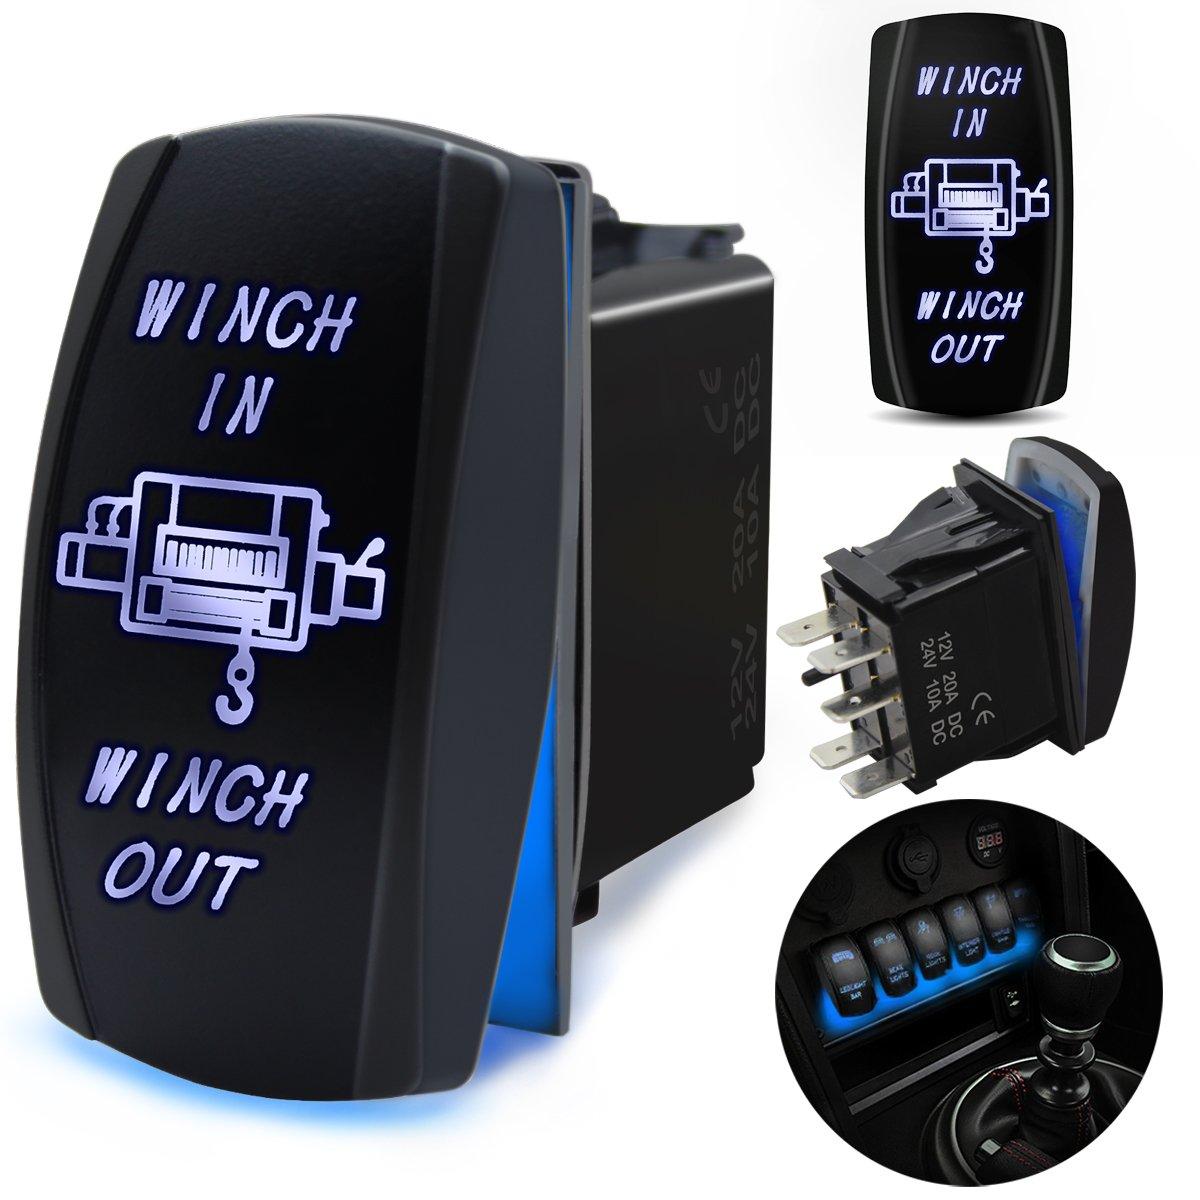 Cheap Atv Rocker Switch, find Atv Rocker Switch deals on line at